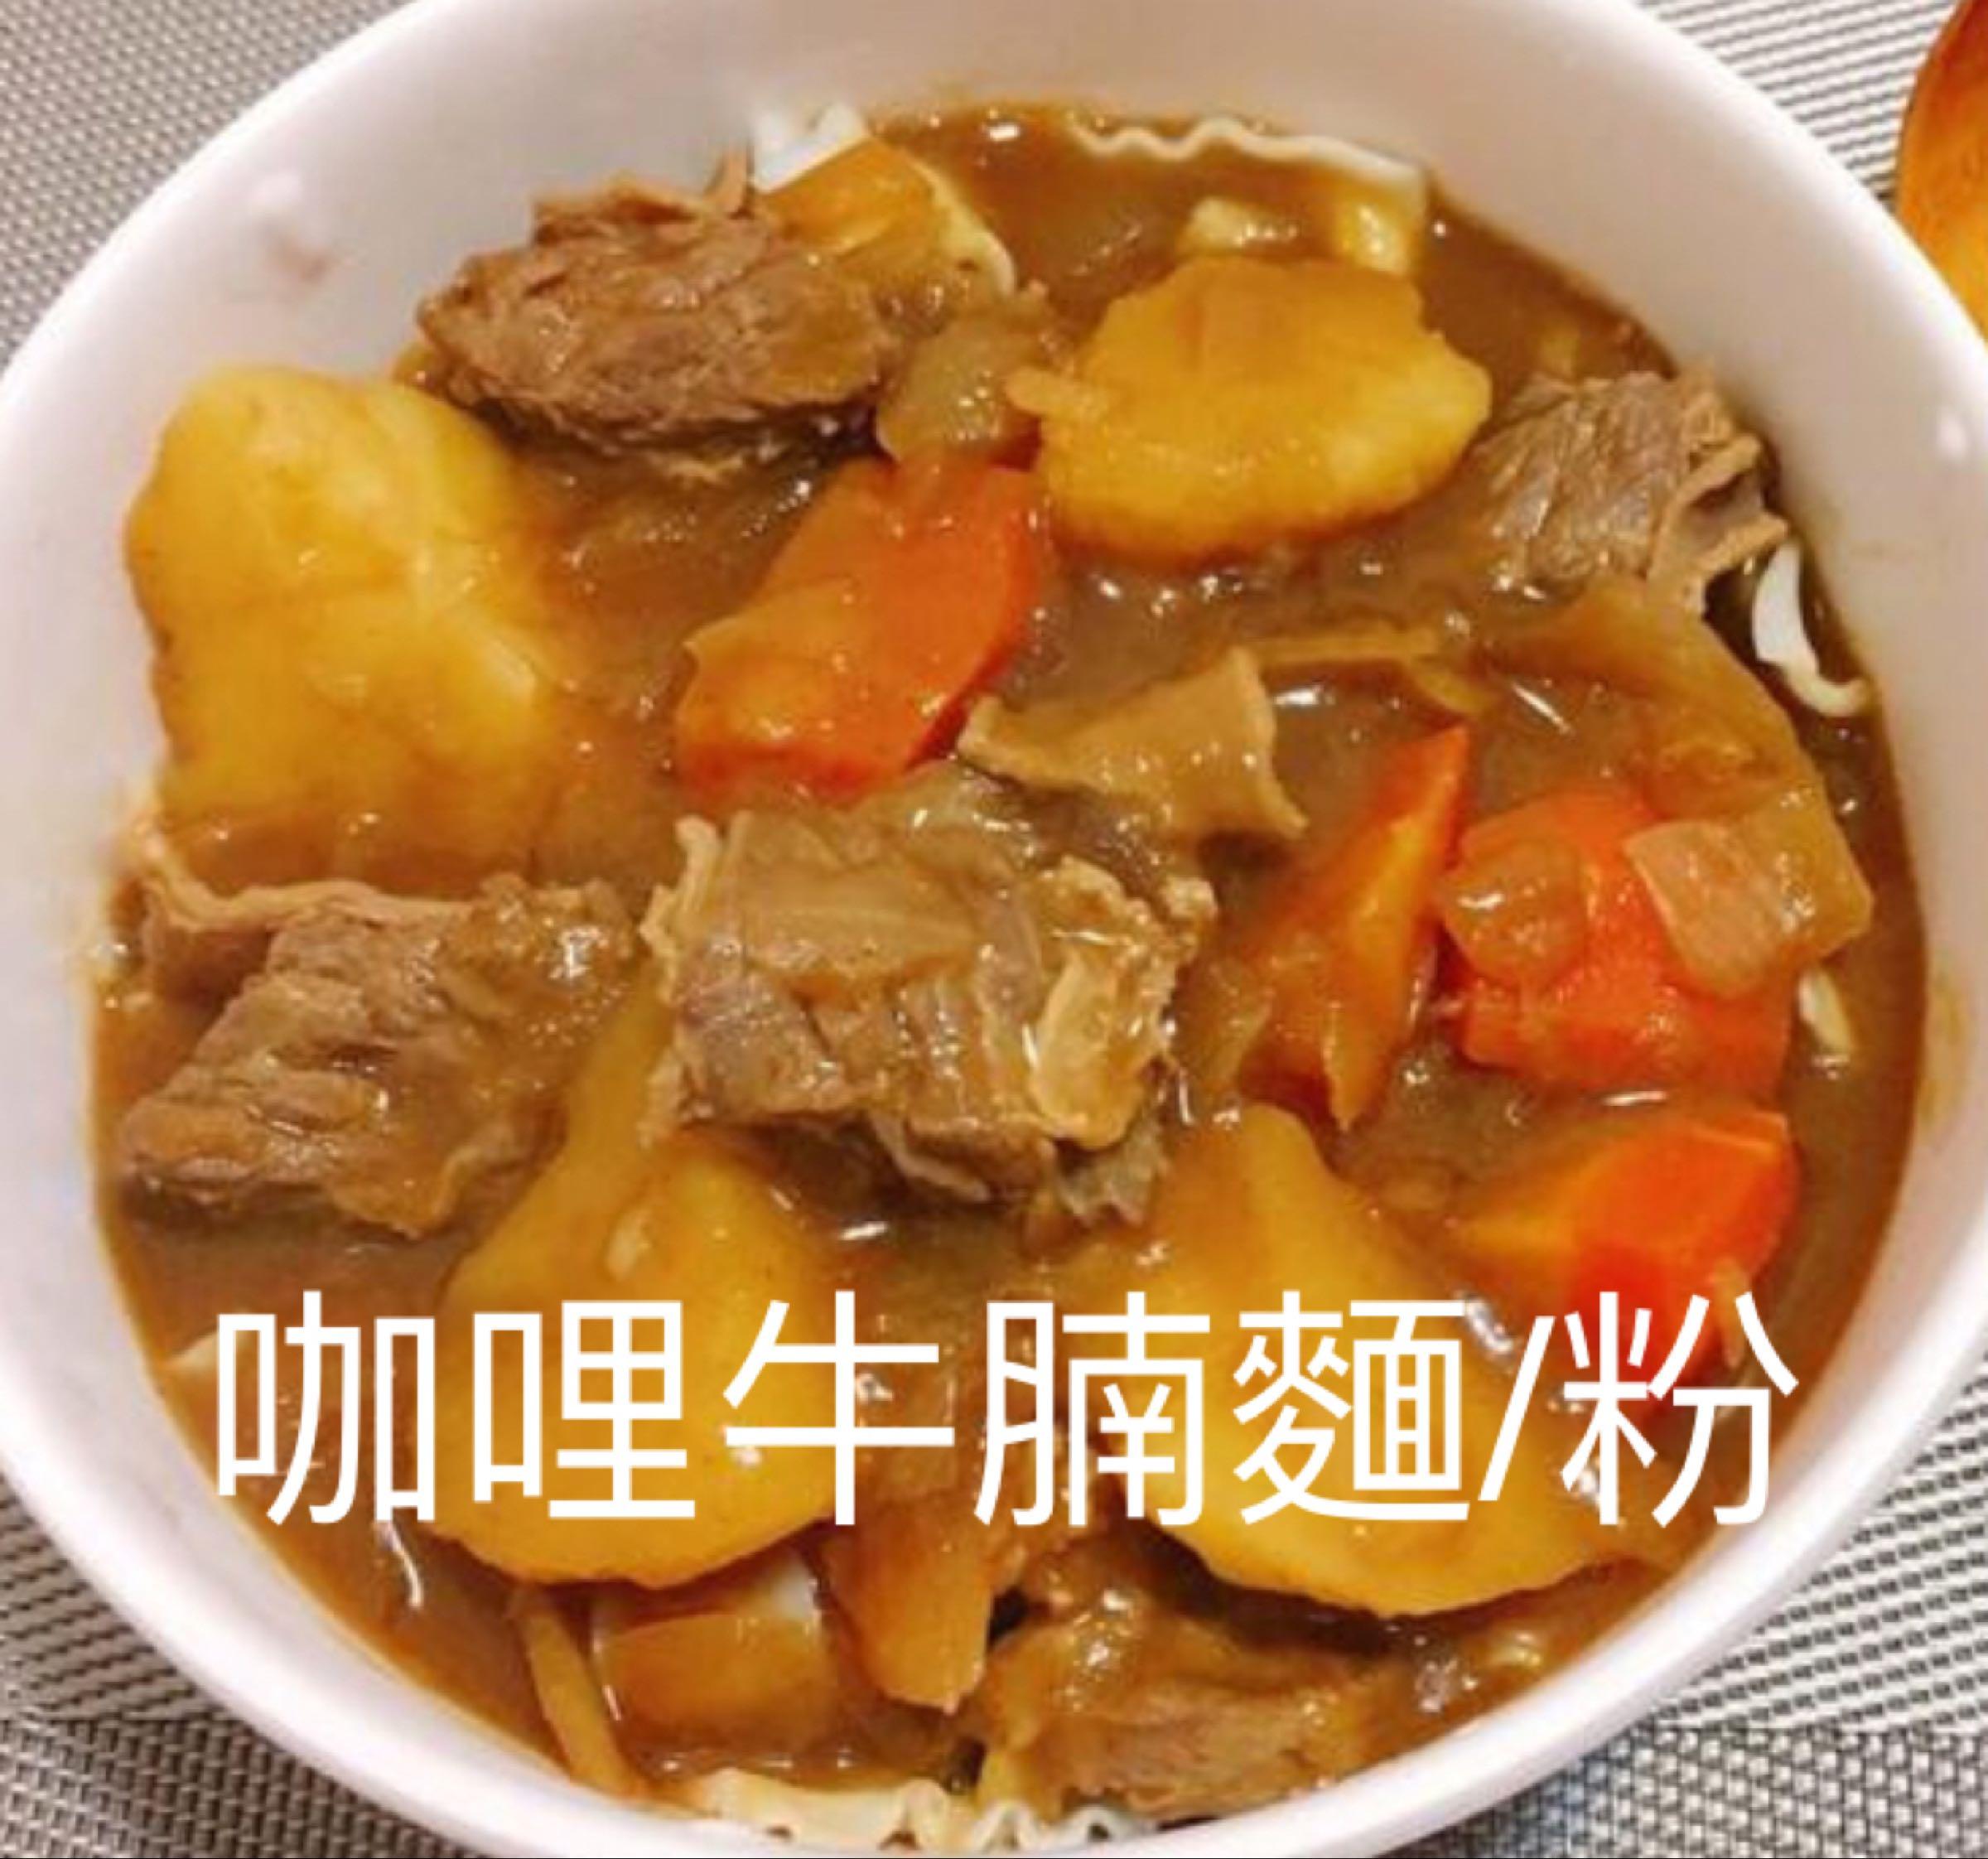 咖哩牛腩湯麵 Beef Curry Soup Noodle